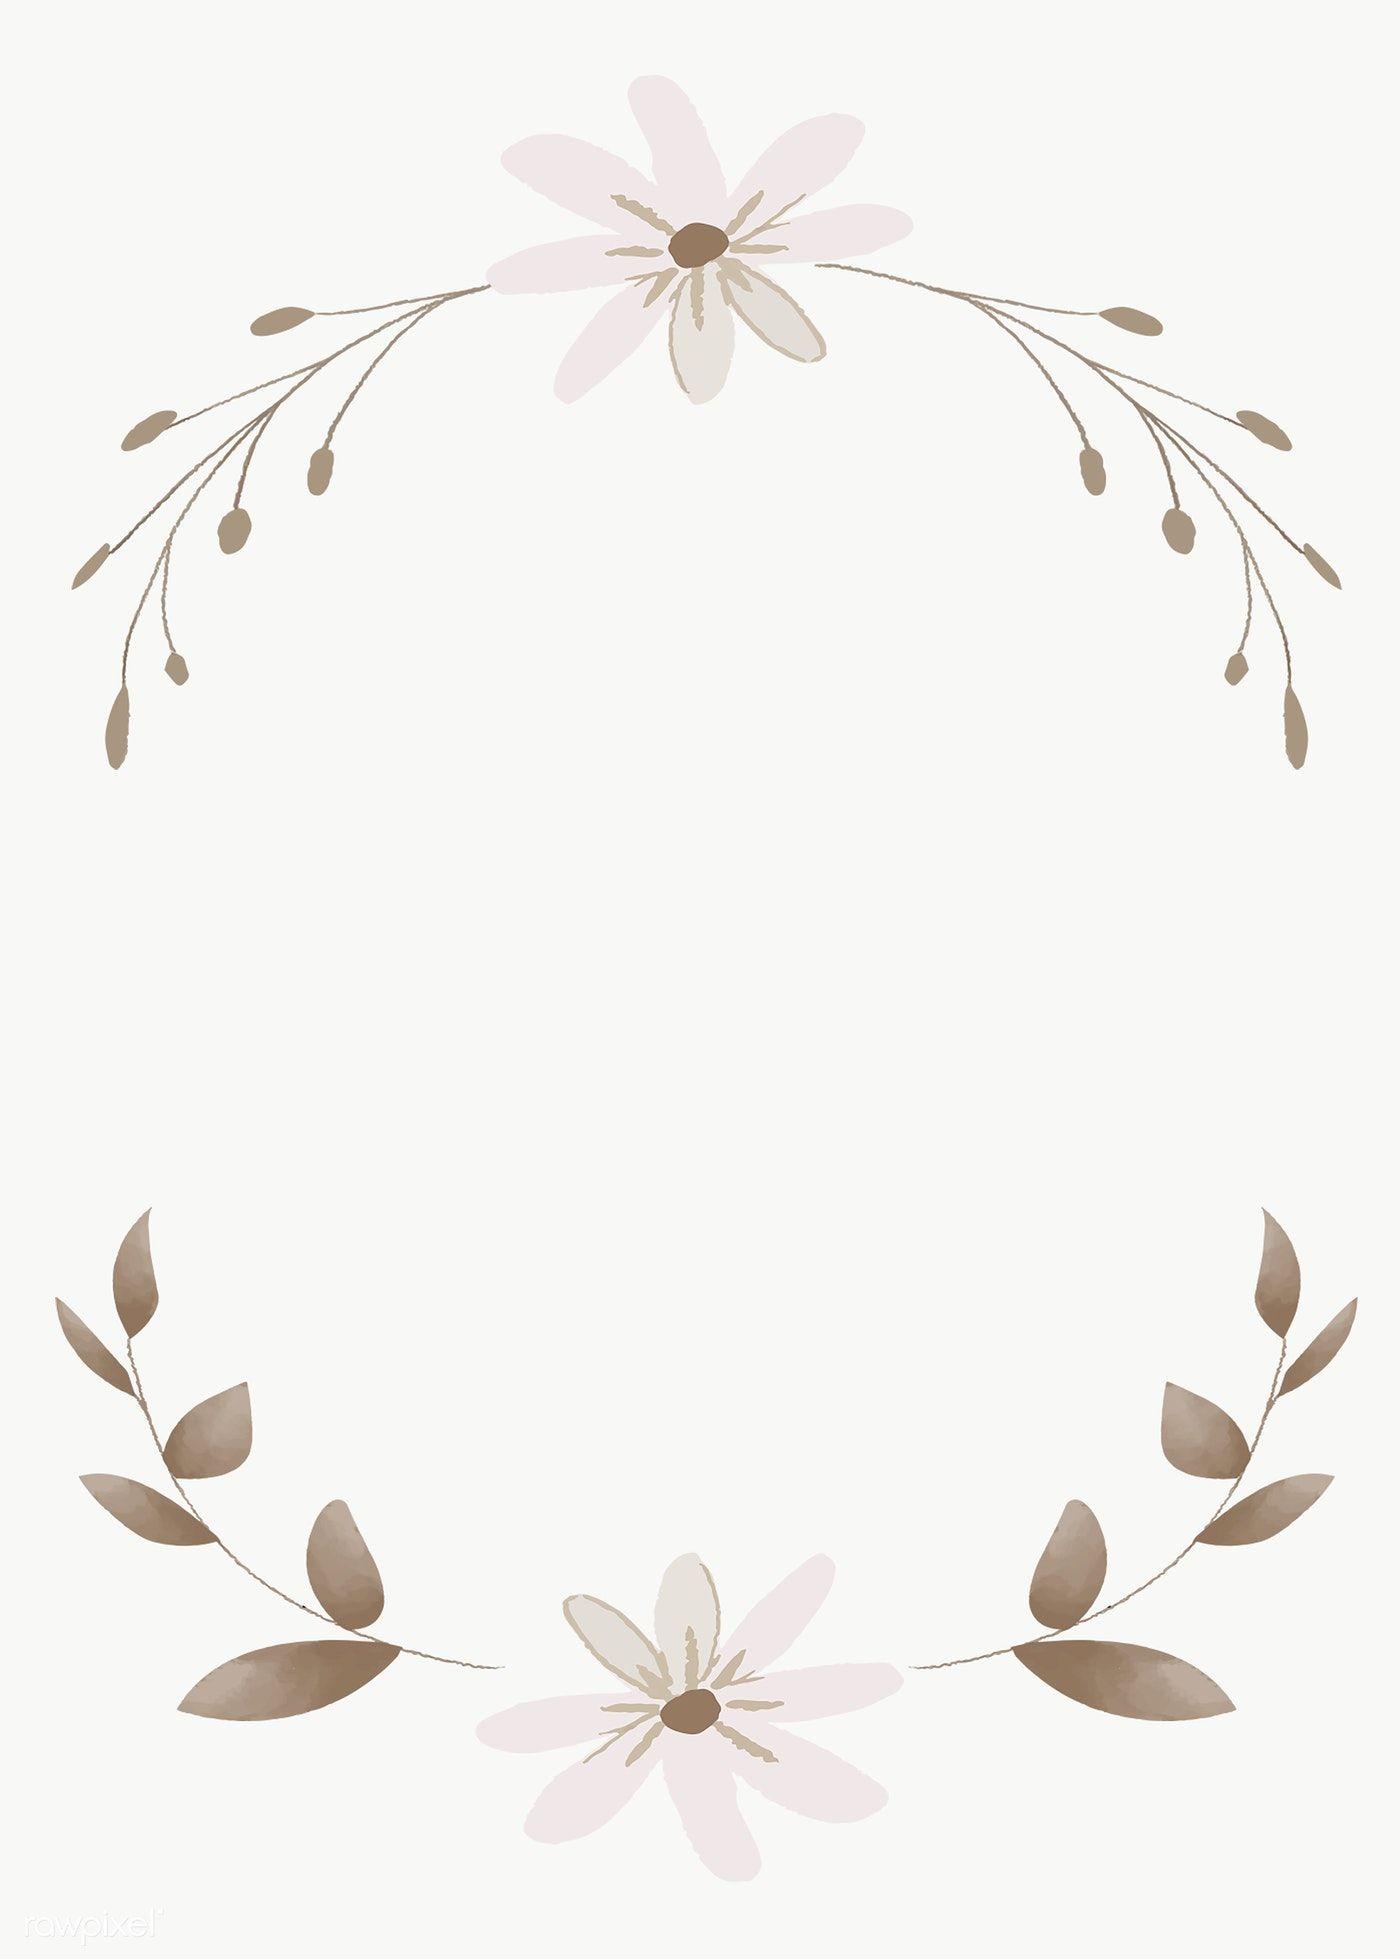 Blank Leafy Inivtation Card Transparent Png Premium Image By Rawpixel Com Adj Flower Illustration Flower Drawing Vector Background Pattern